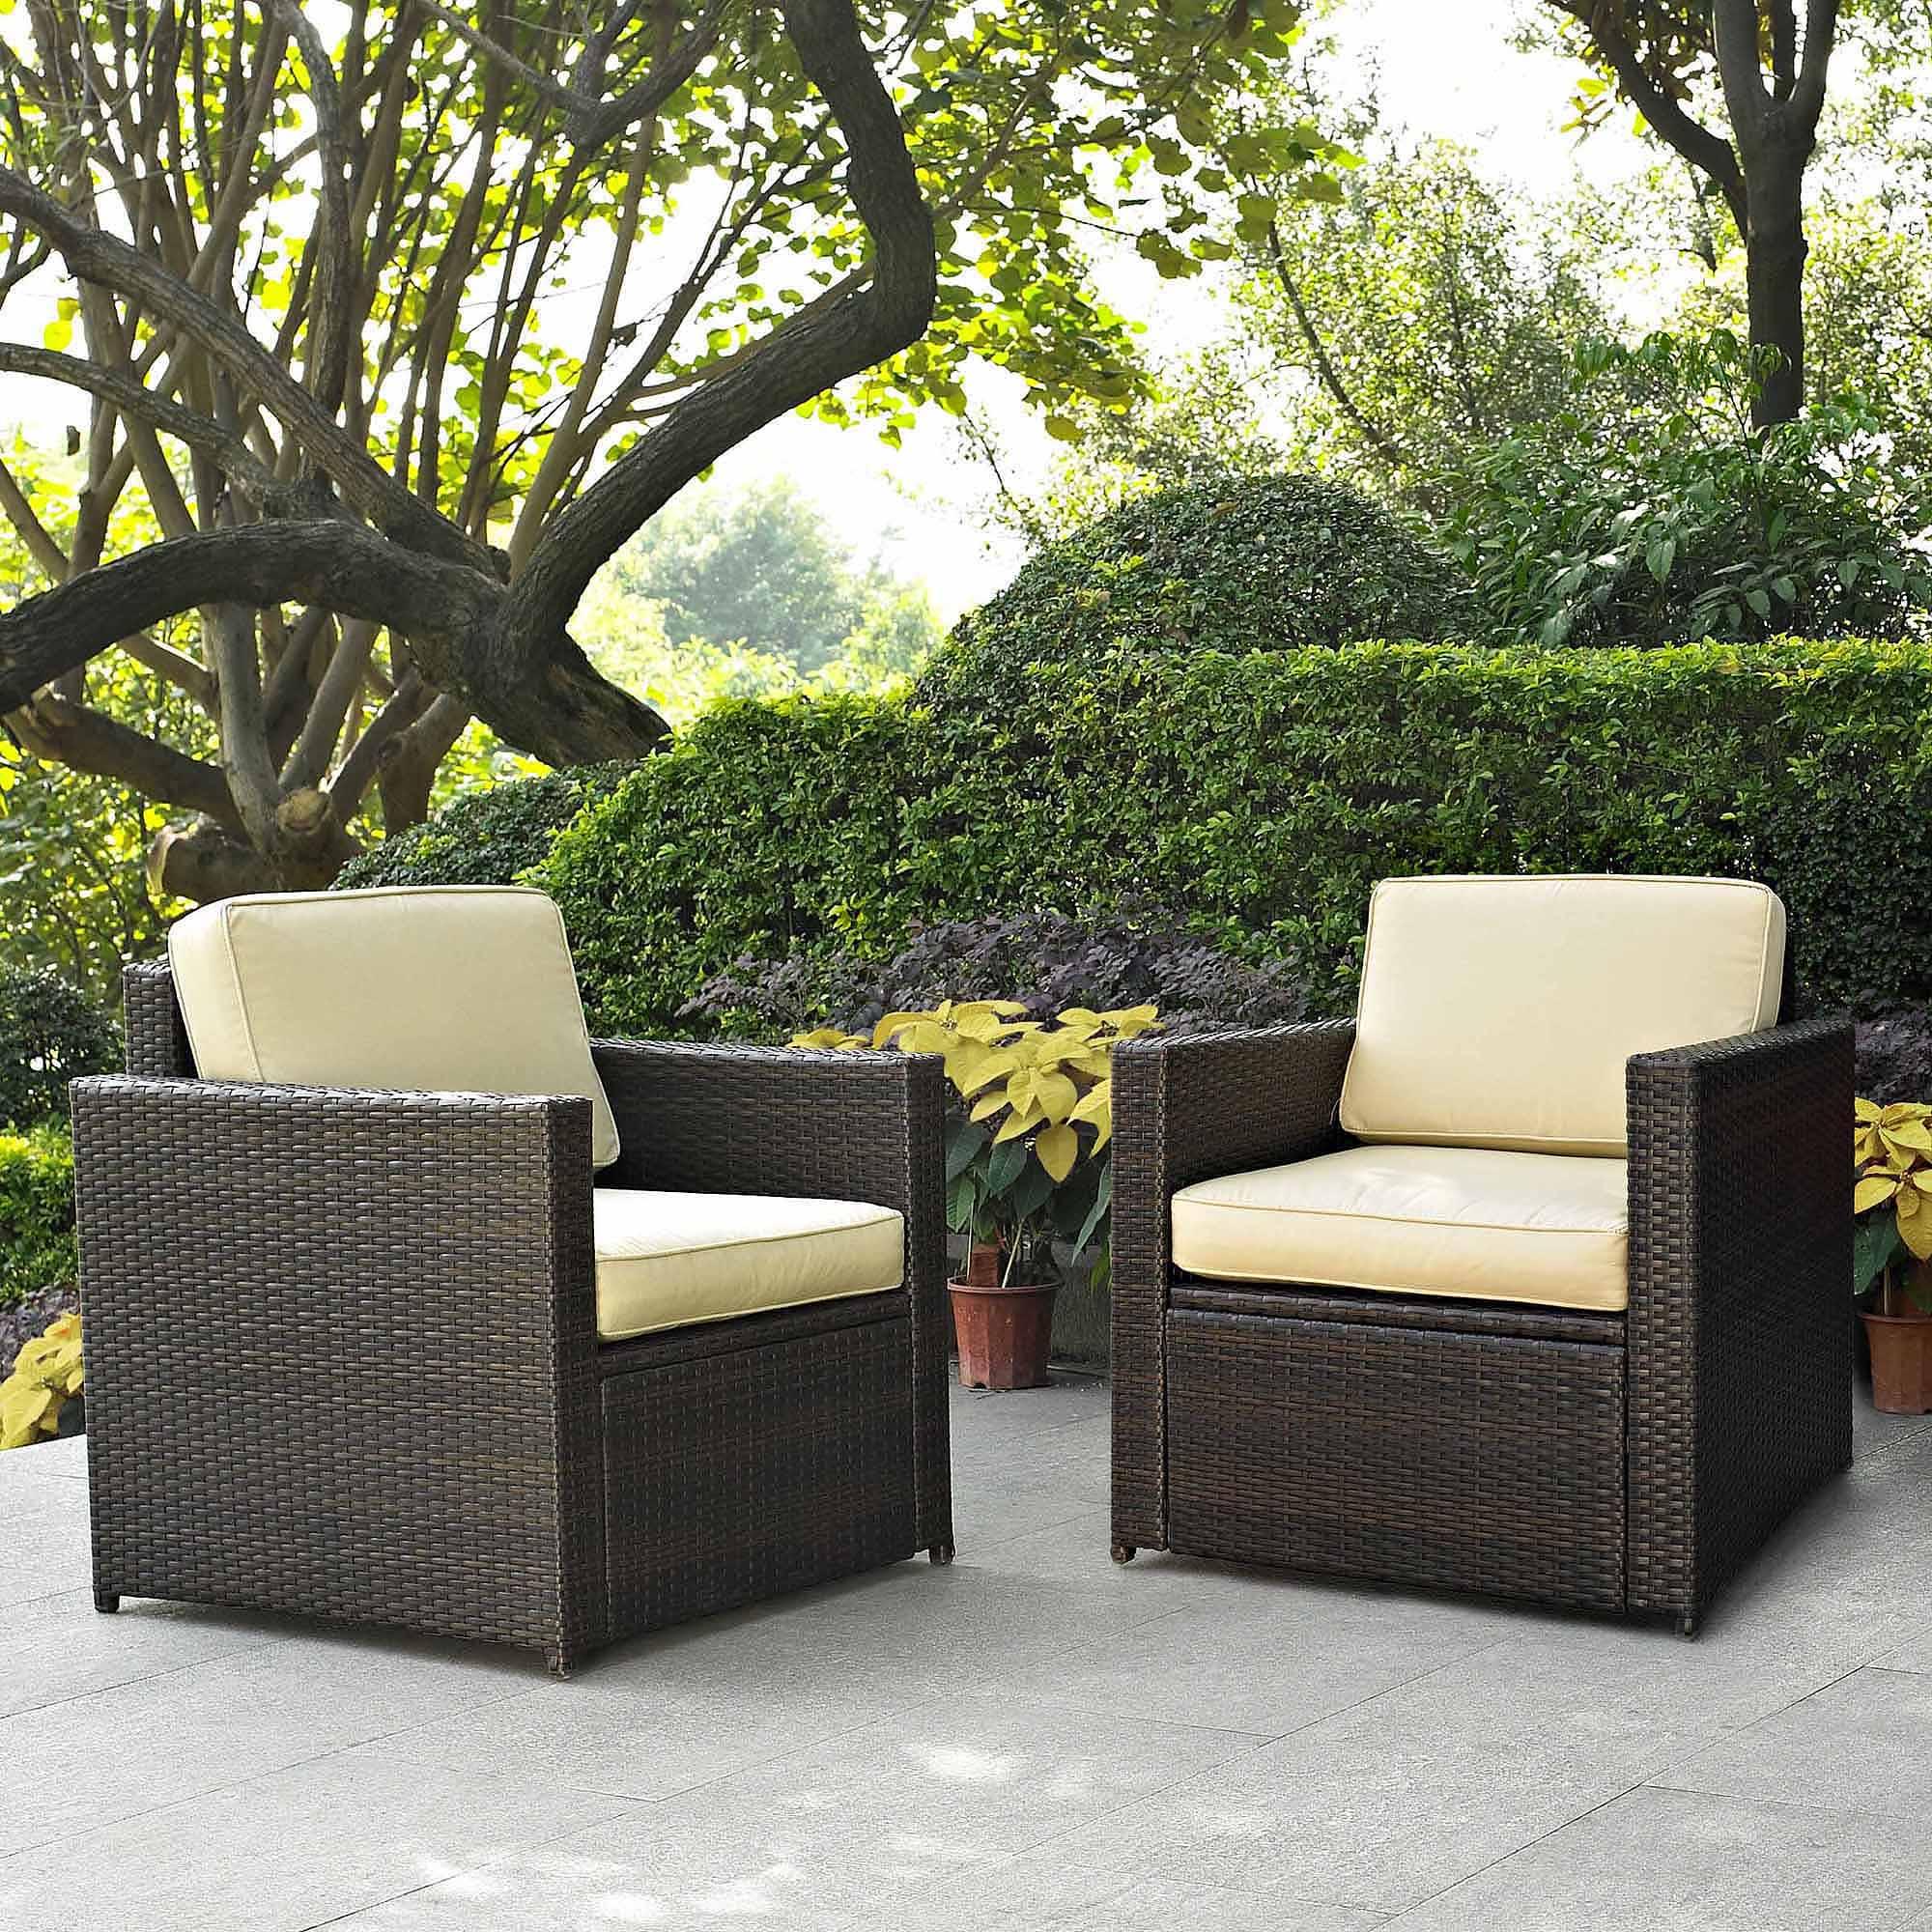 patio & garden : Comparison Between Natural And Resin Wicker Outdoor ...